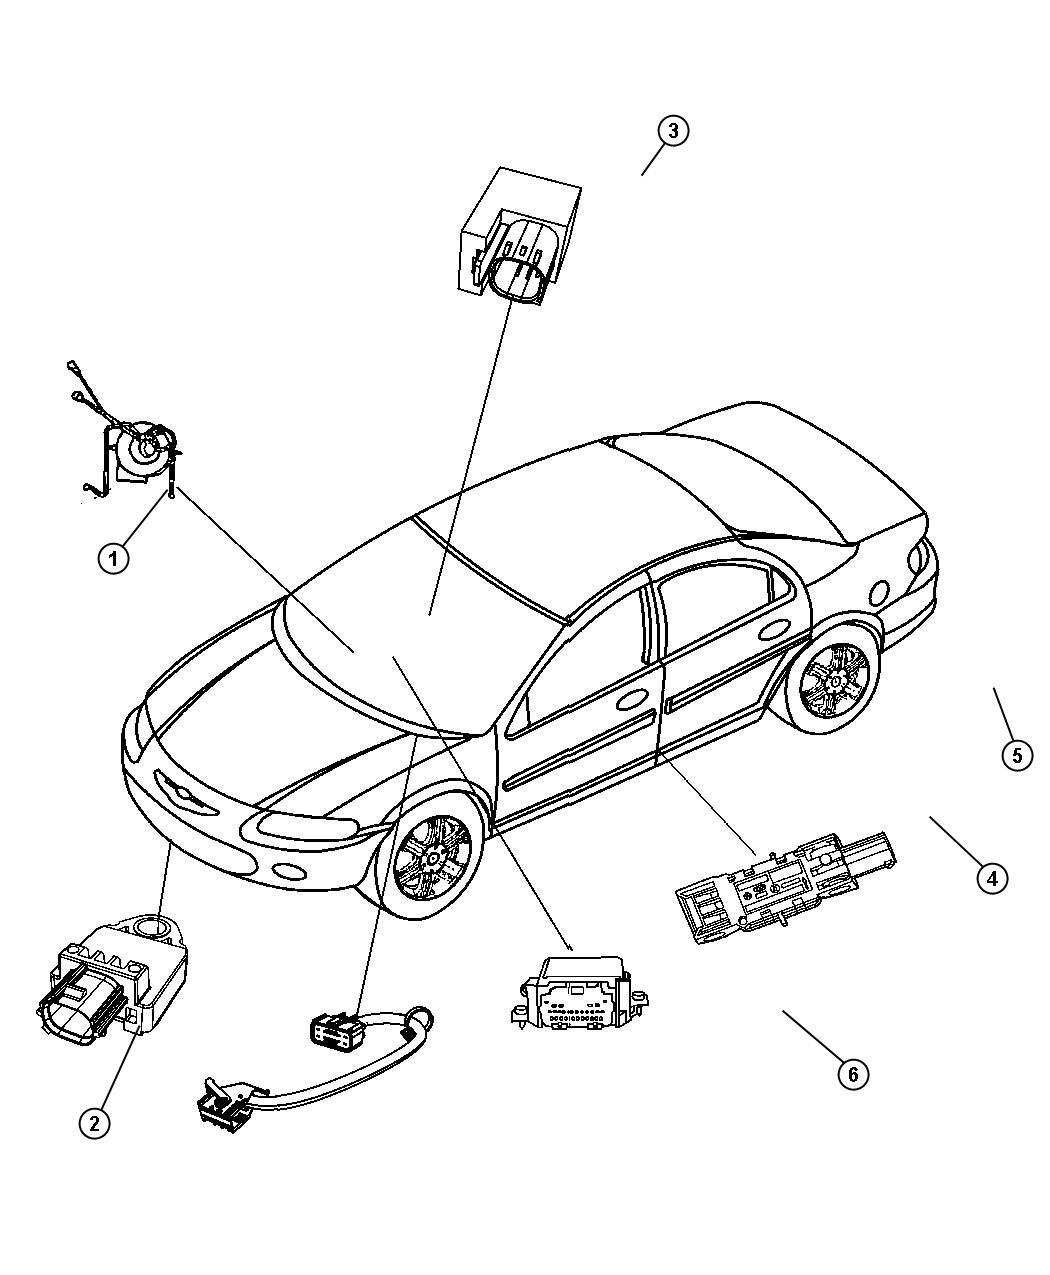 2012 Dodge Avenger Air Bag Modules, Impact Sensors and